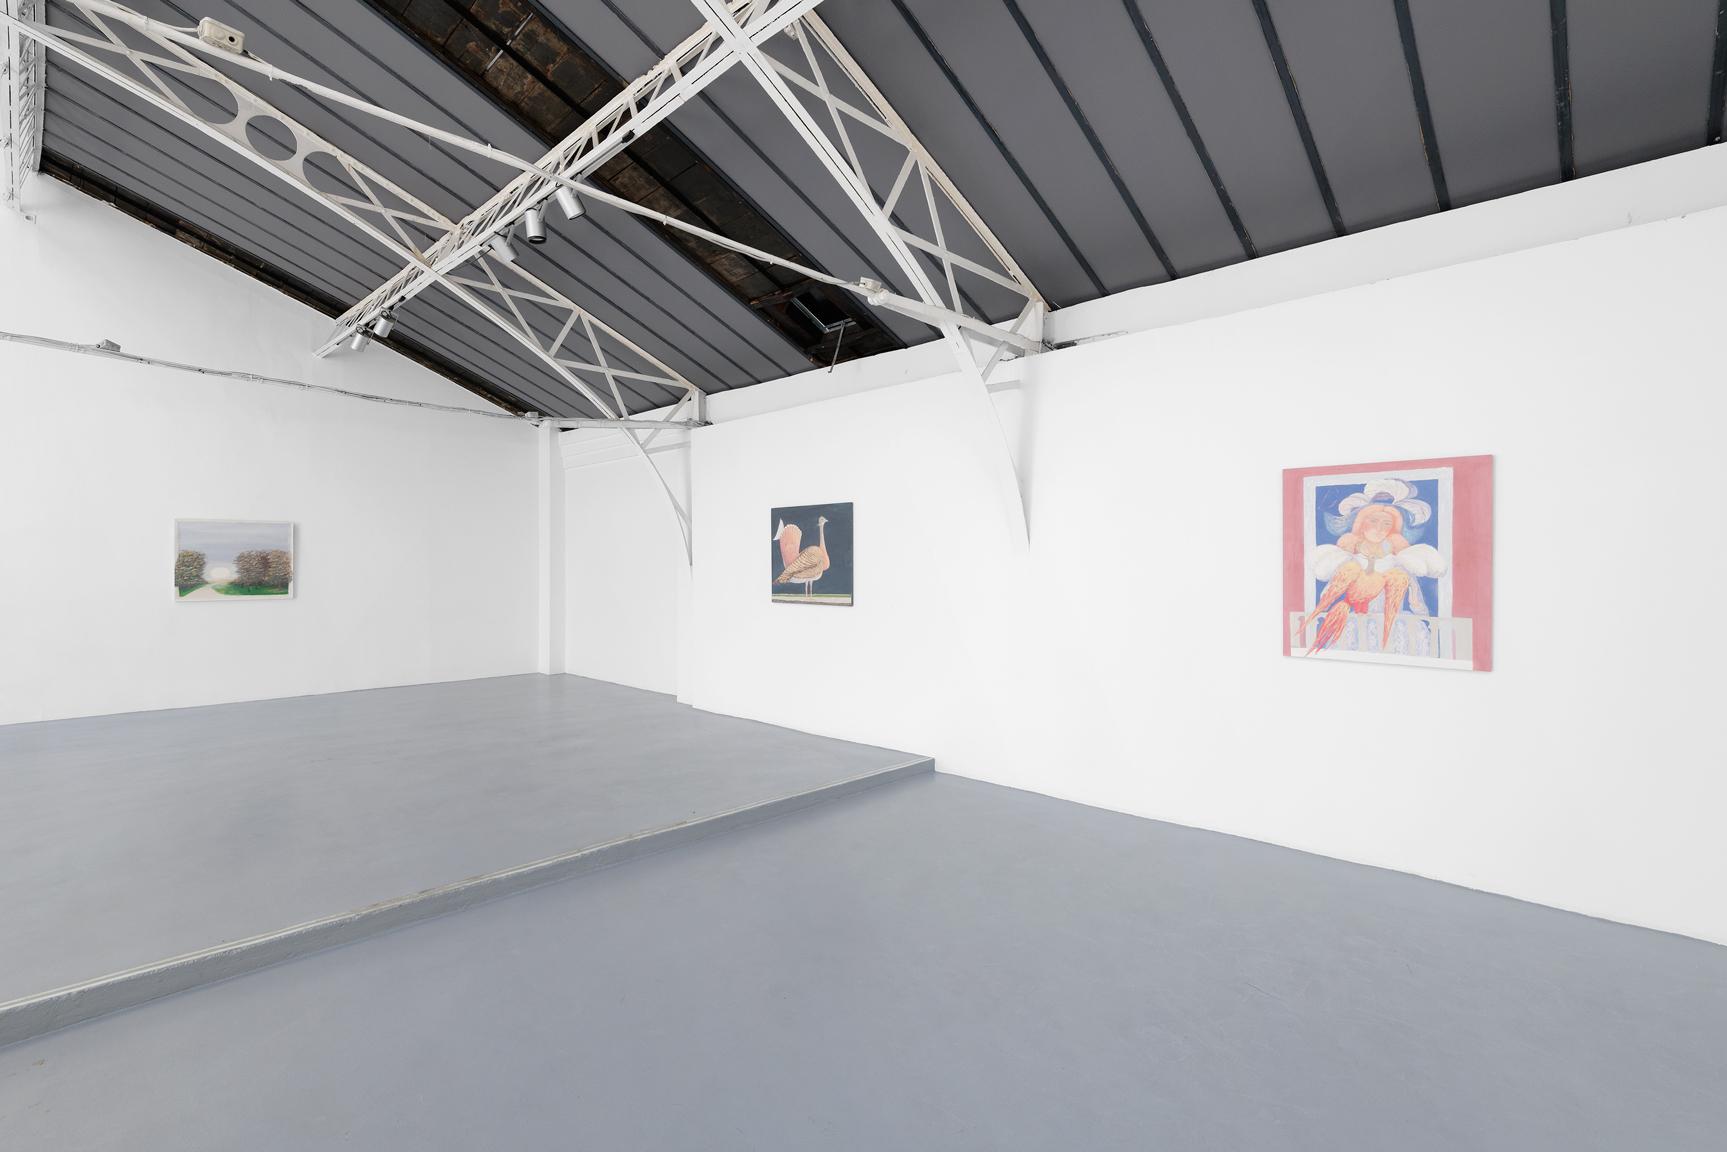 Sorin Câmpan Vue d'installation, Hussenot, Paris — Galerie Éric Hussenot, Paris